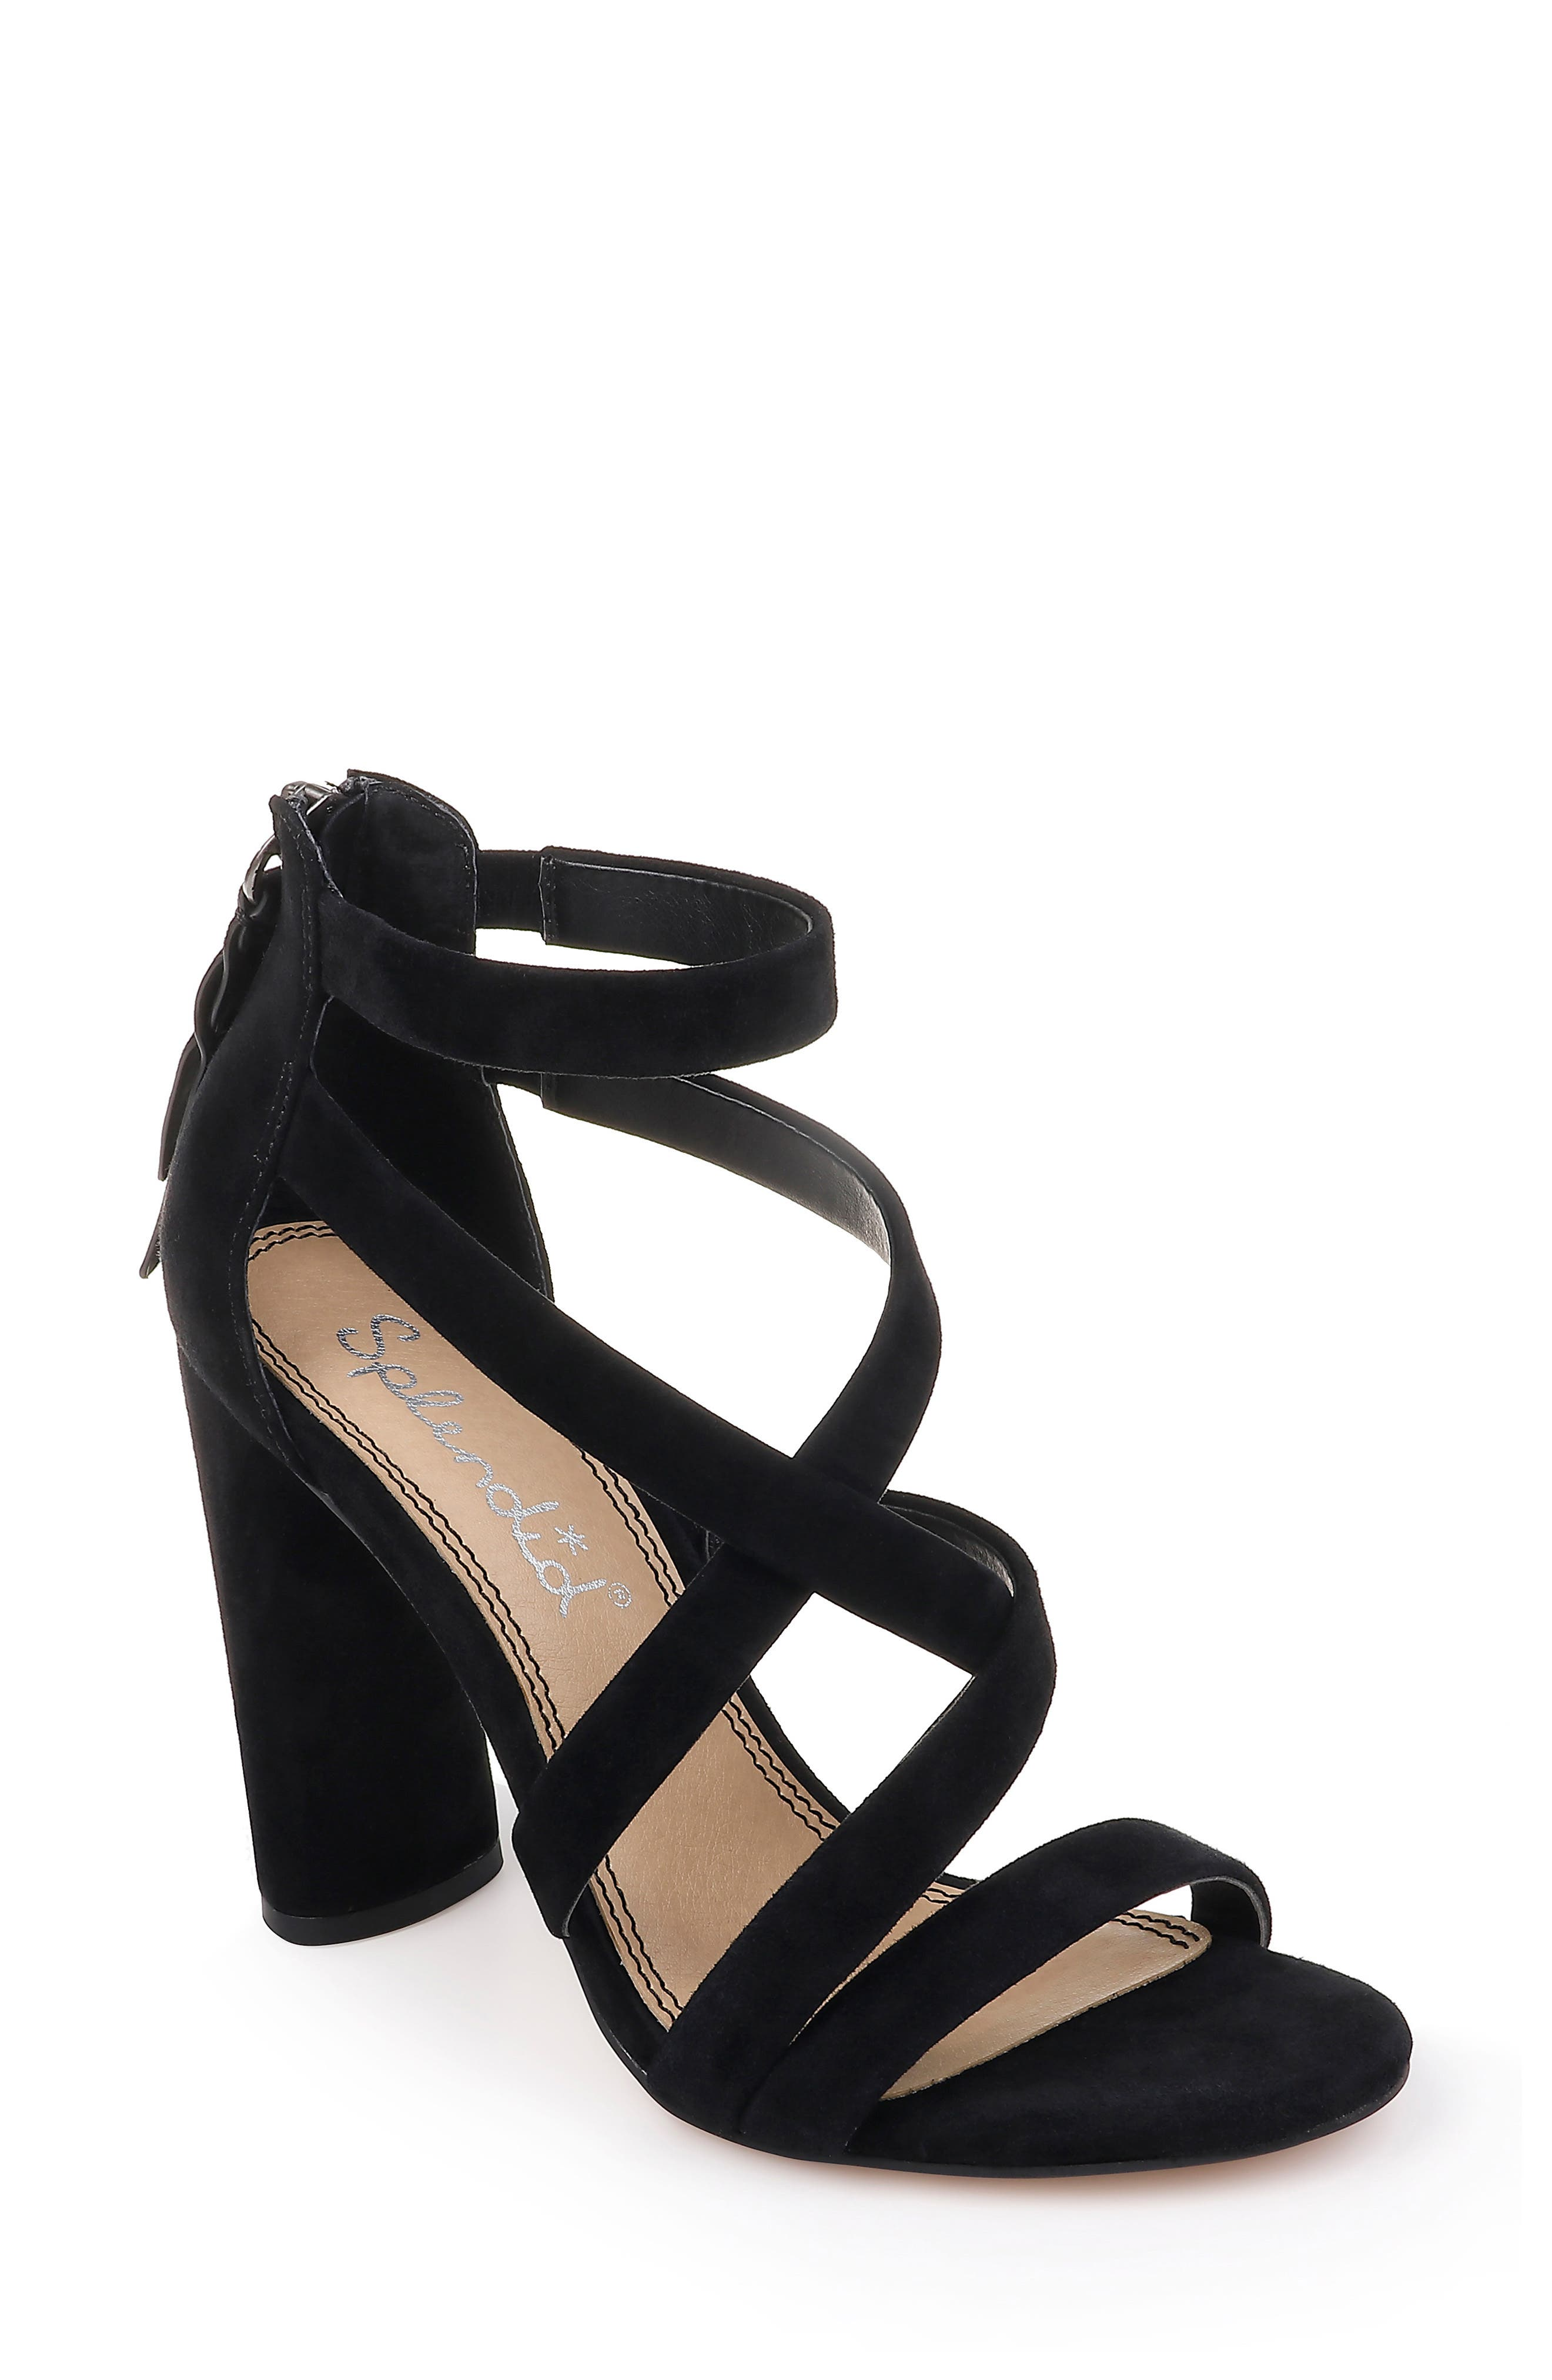 SPLENDID Stuart Block Heel Sandal, Main, color, BLACK SUEDE